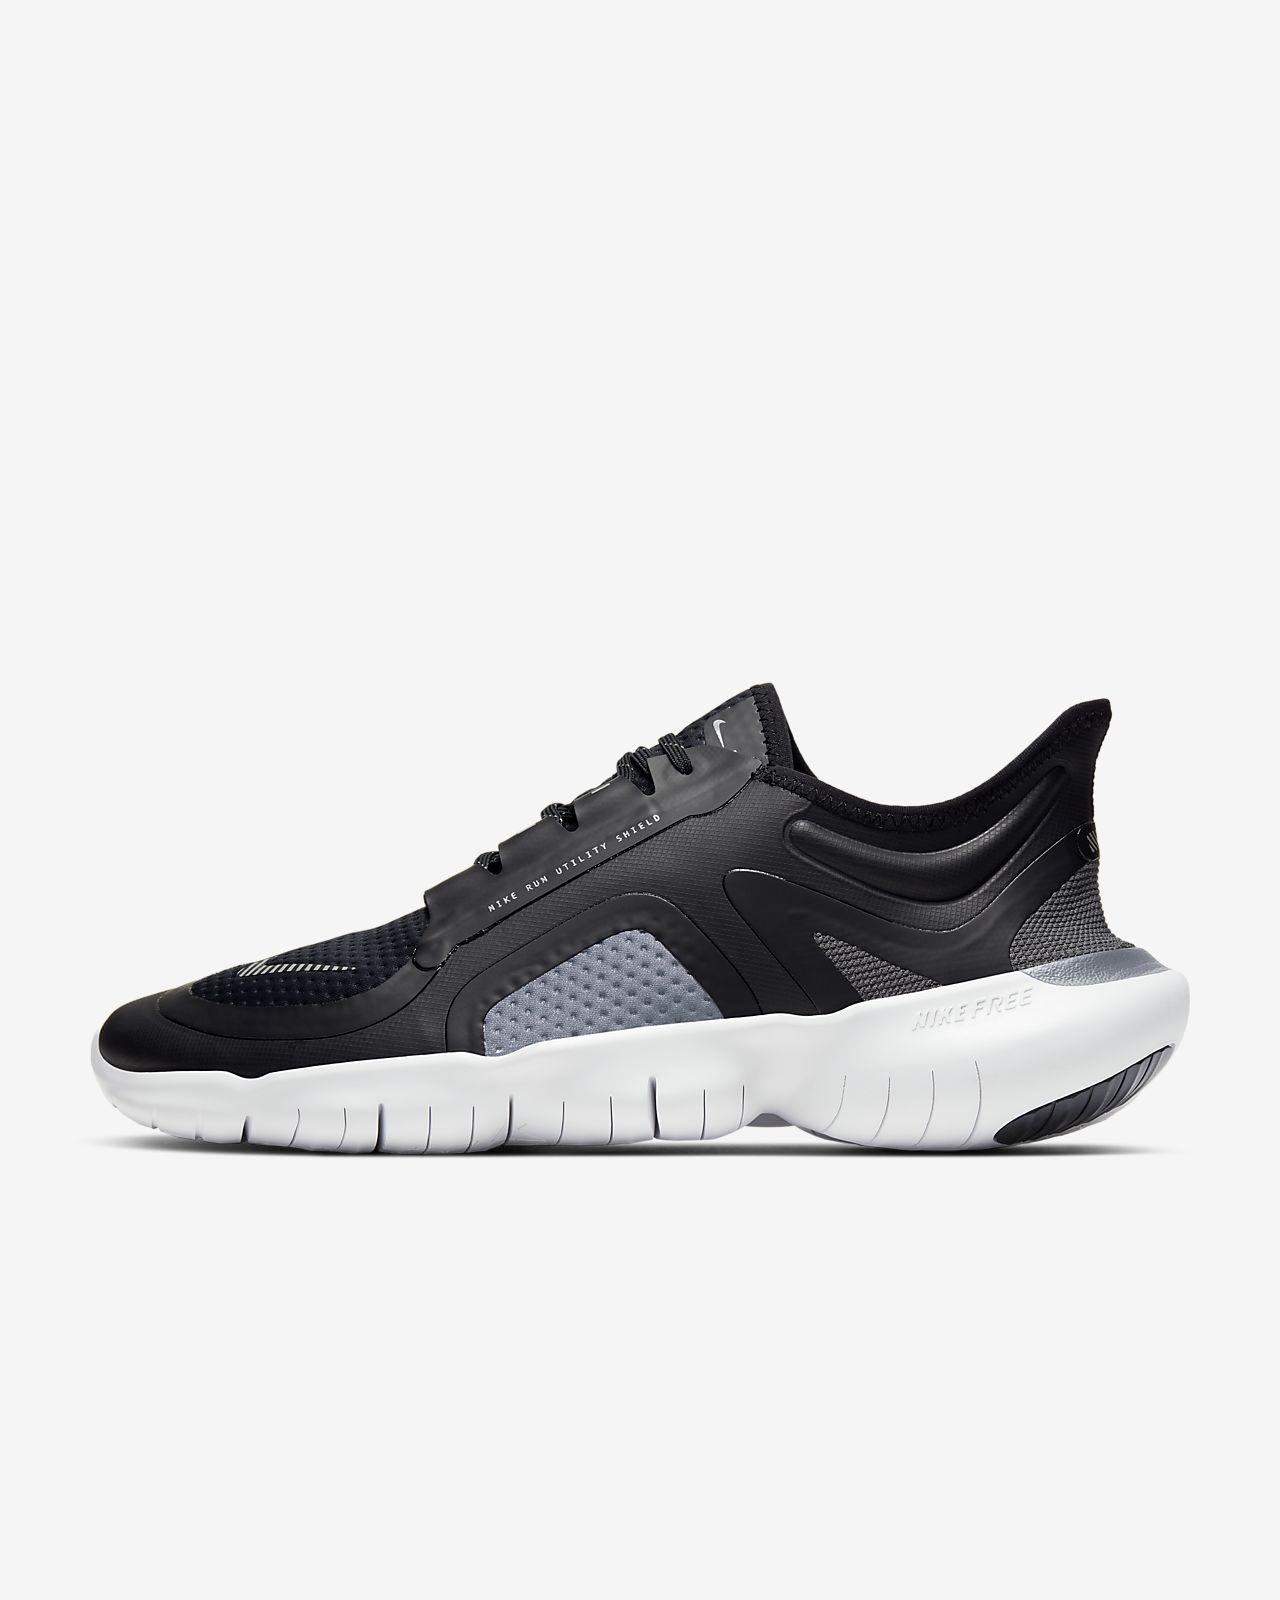 Nike Free RN 5.0 Shield Herren-Laufschuh